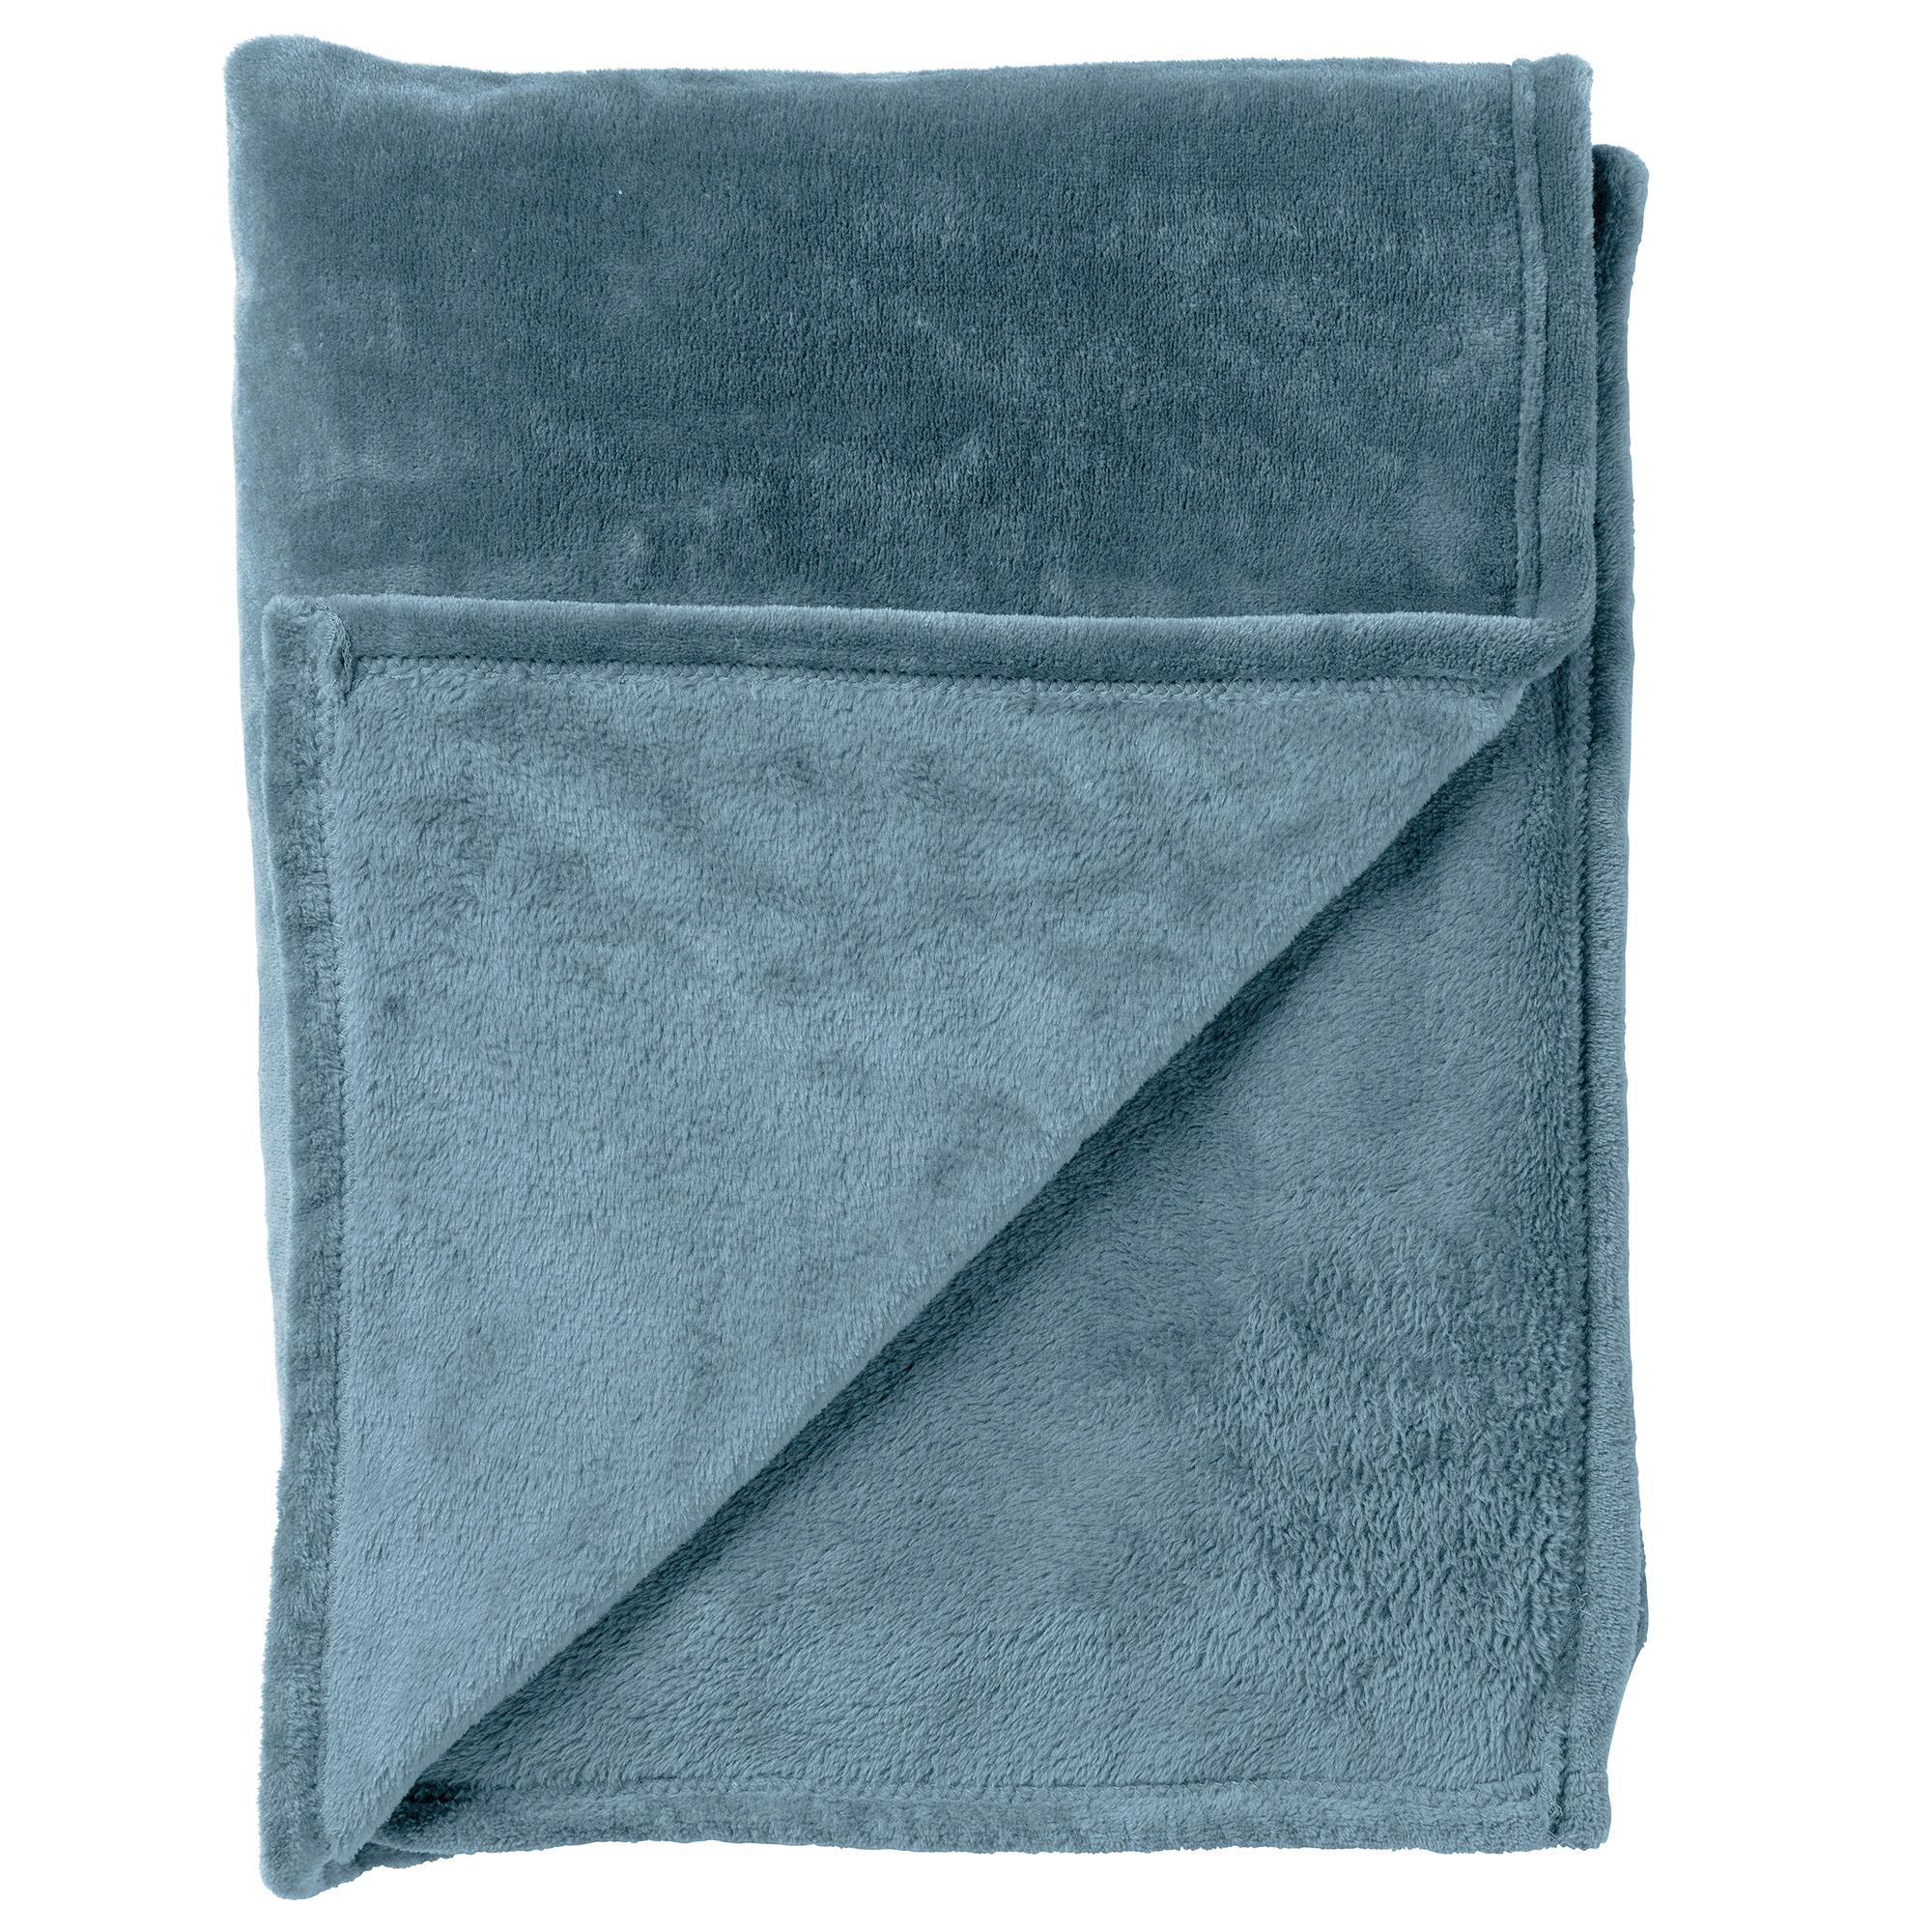 BILLY - Plaid Provincial Blue 150x200 cm